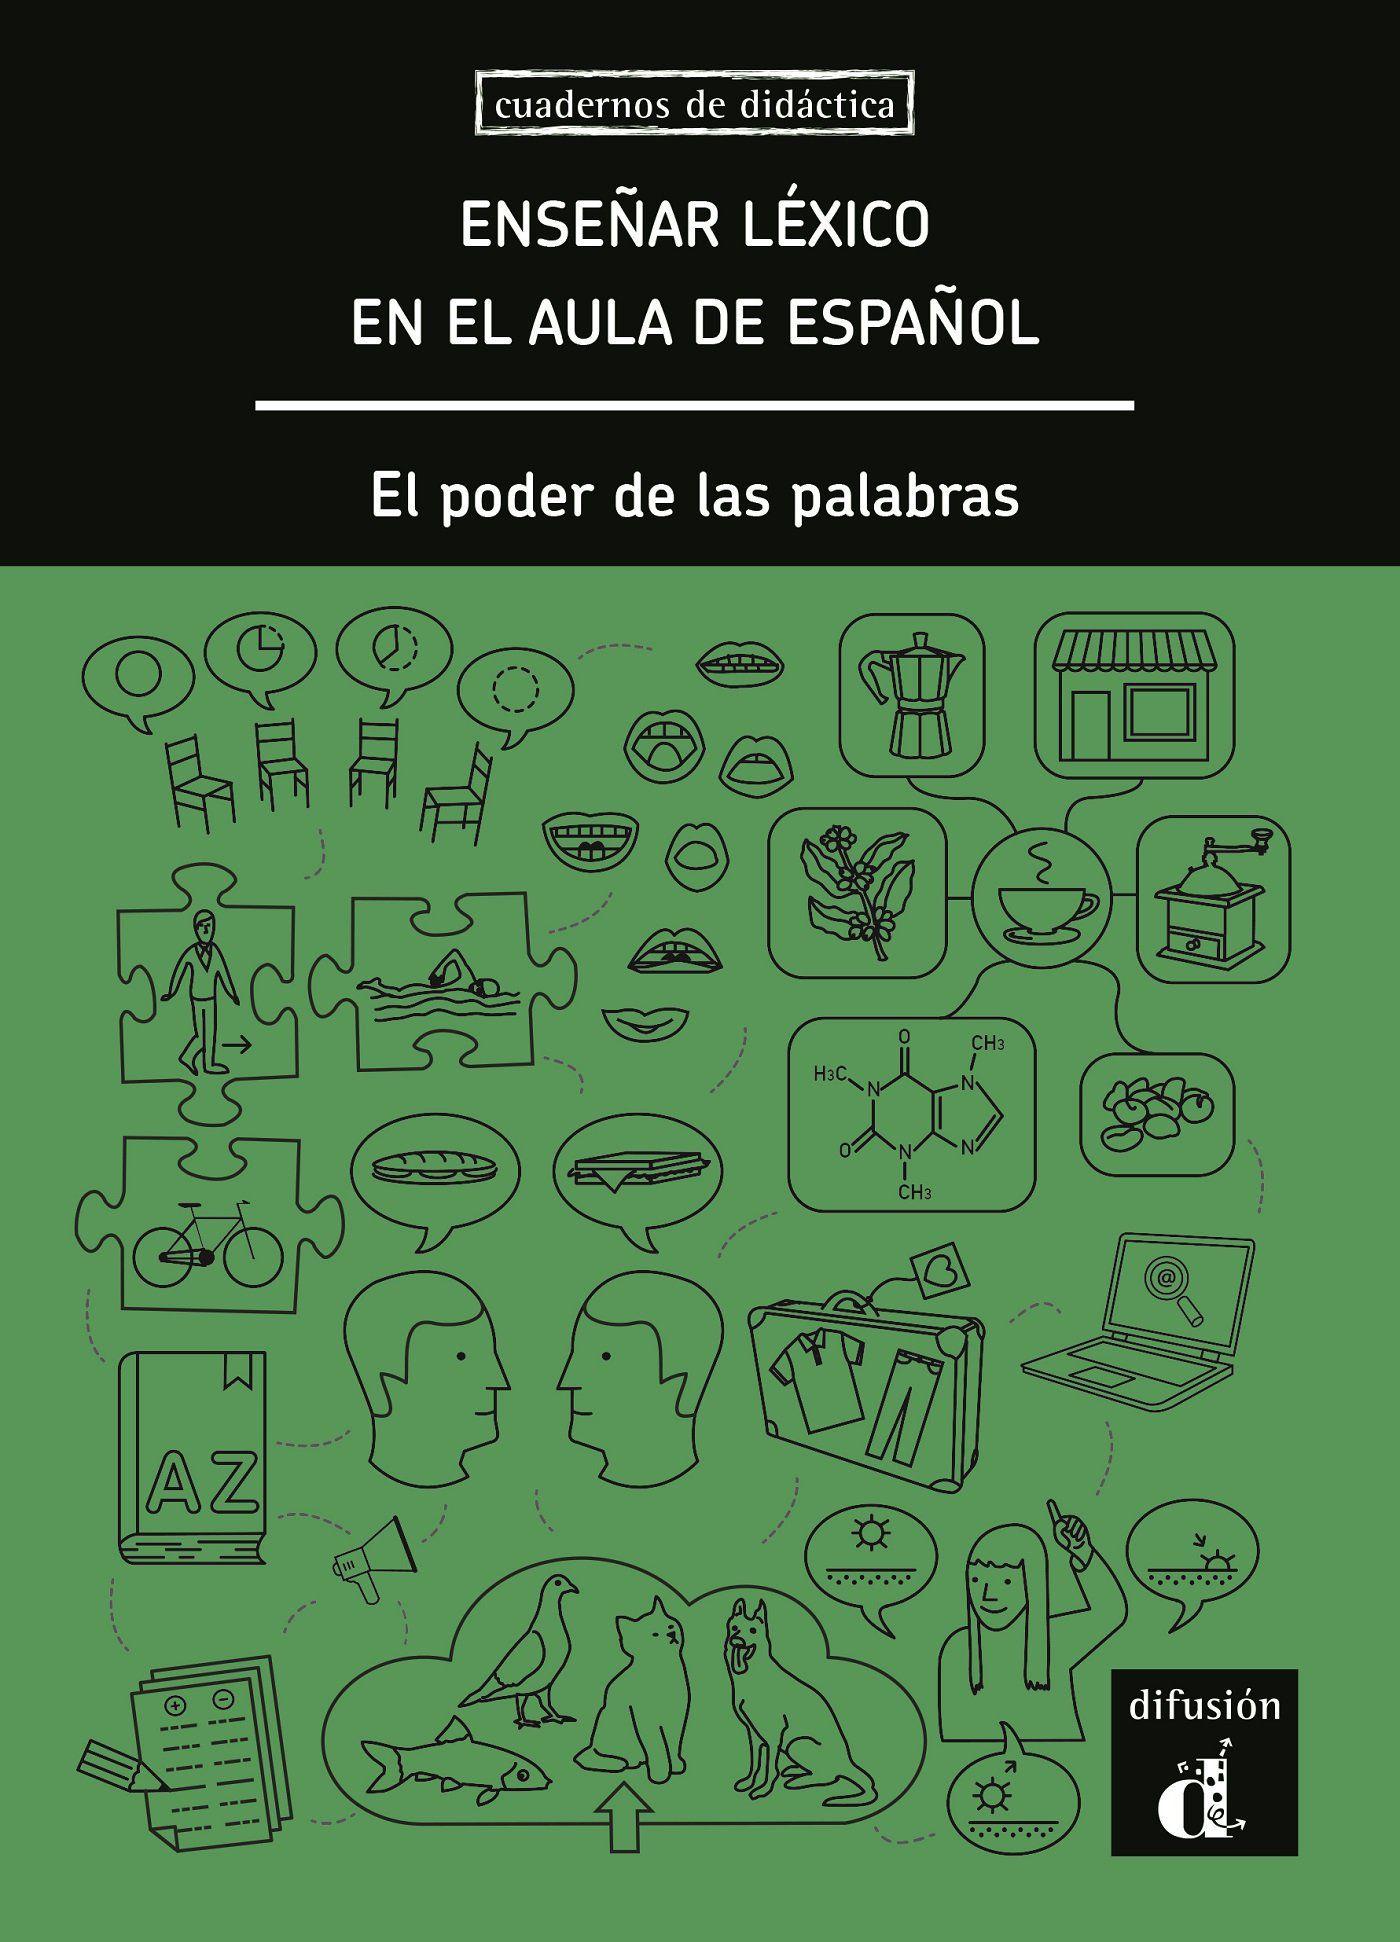 ENSENAR LEXICO EN AULA DE ESPANOL-EL PODER DE LAS